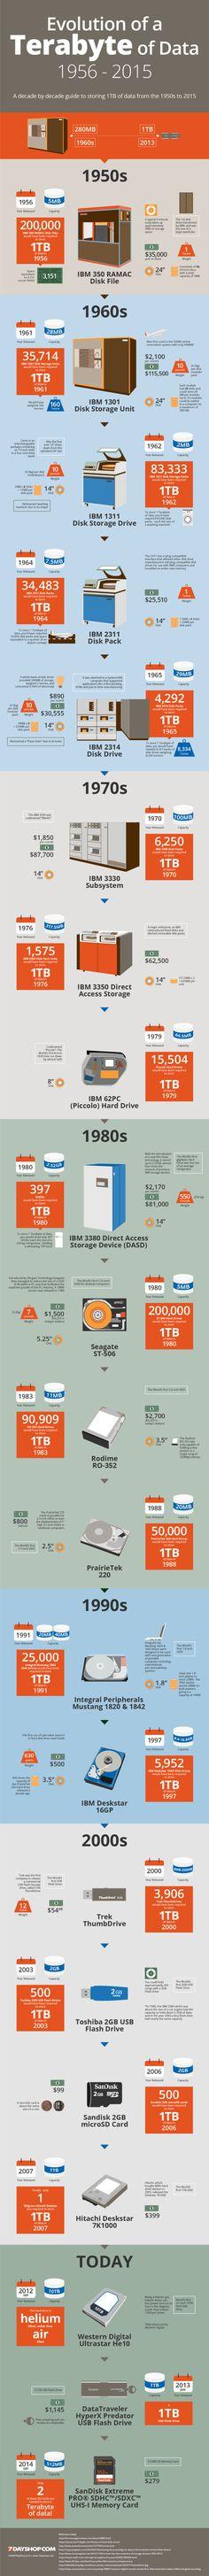 Evolution-of-a-Terabyte-of-Data-7DayShop-800px